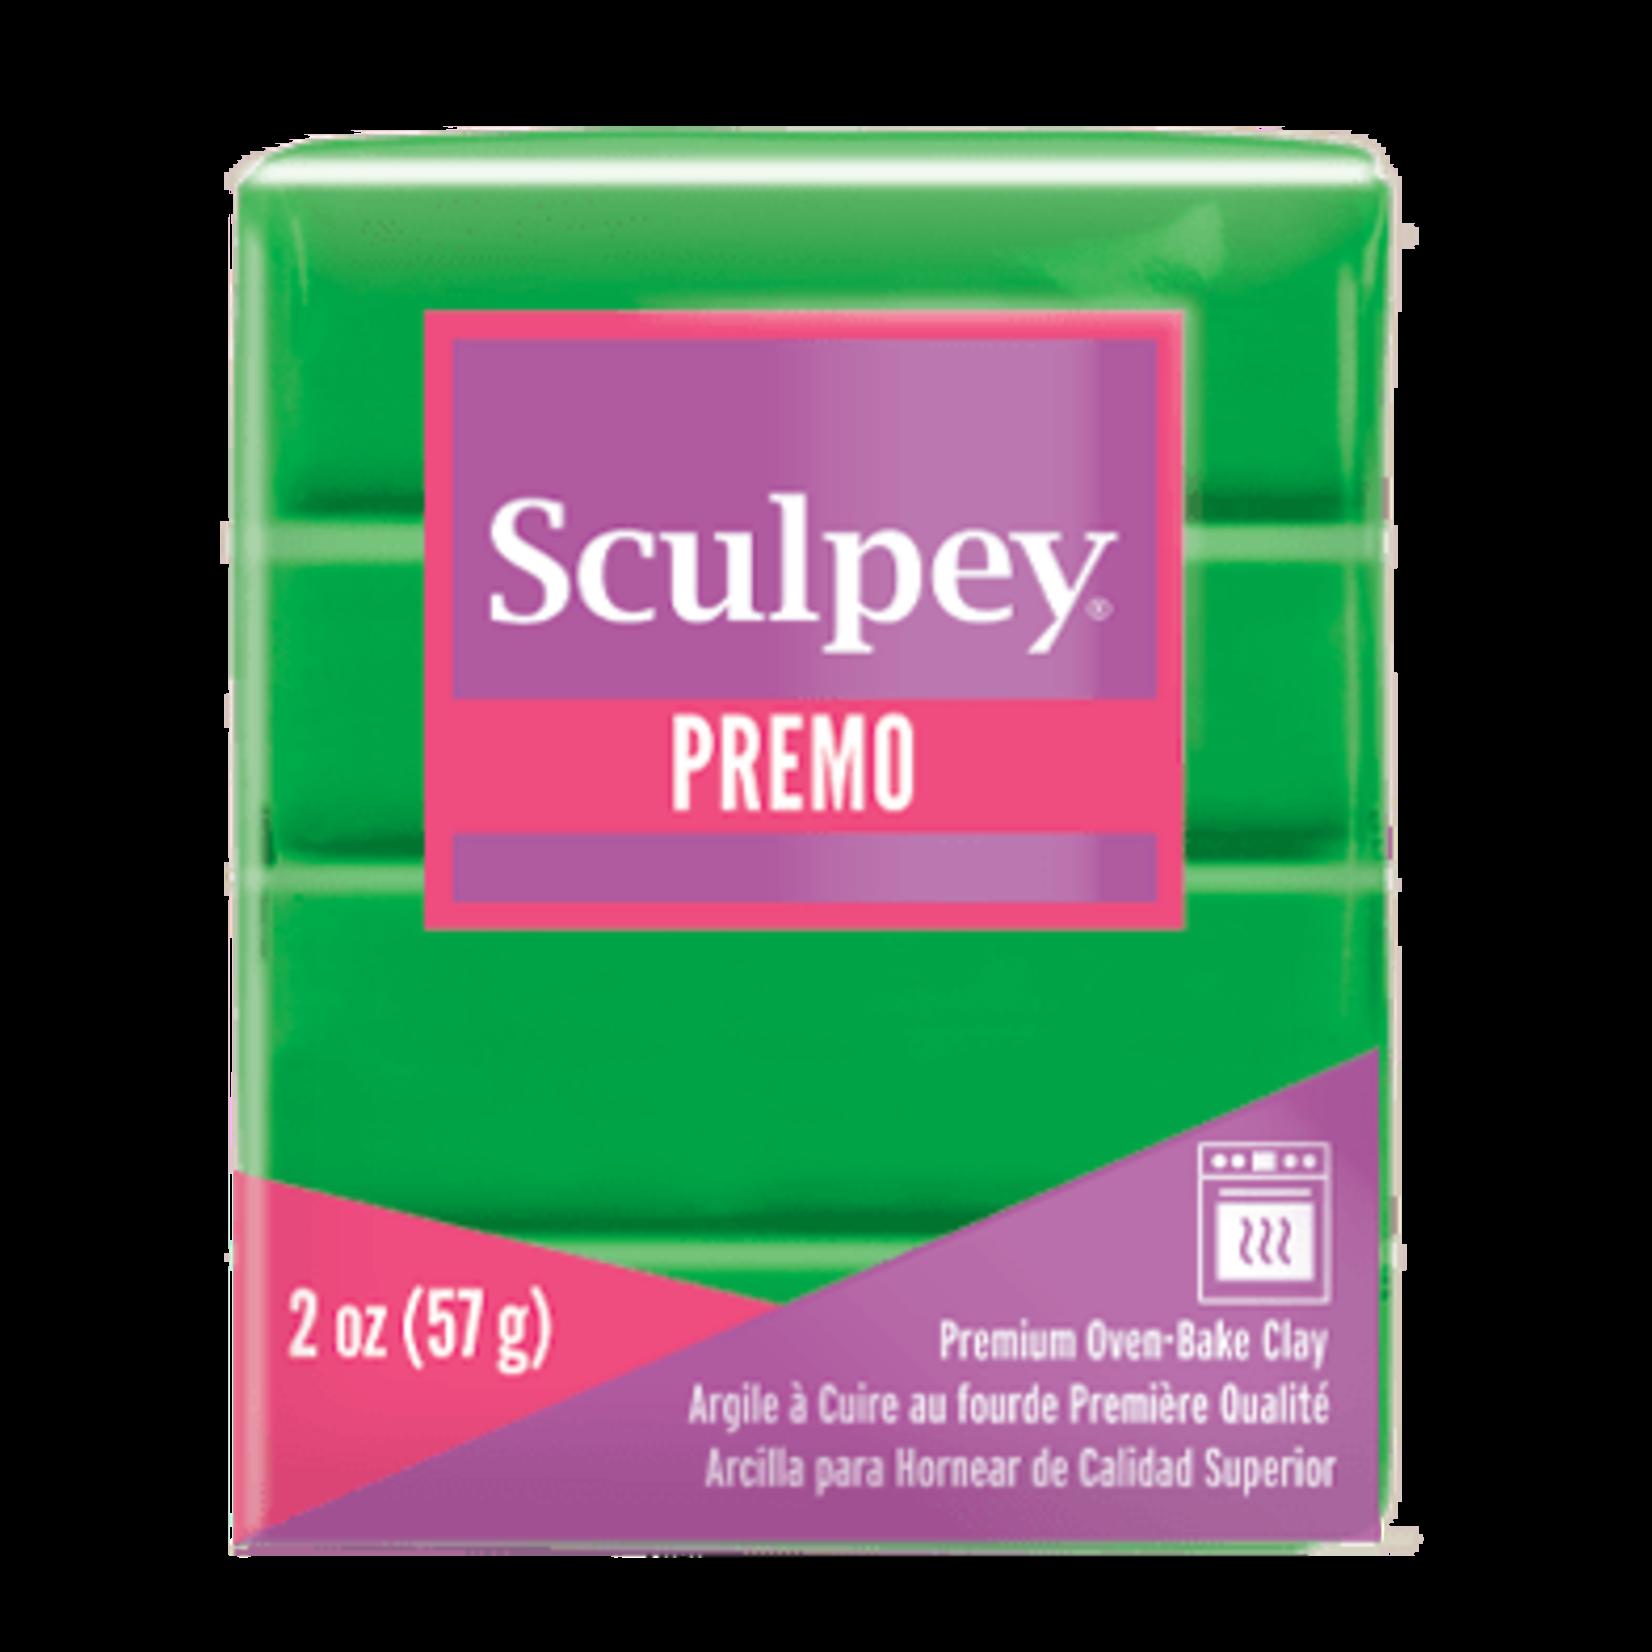 Sculpey Sculpey Premo  -- Green